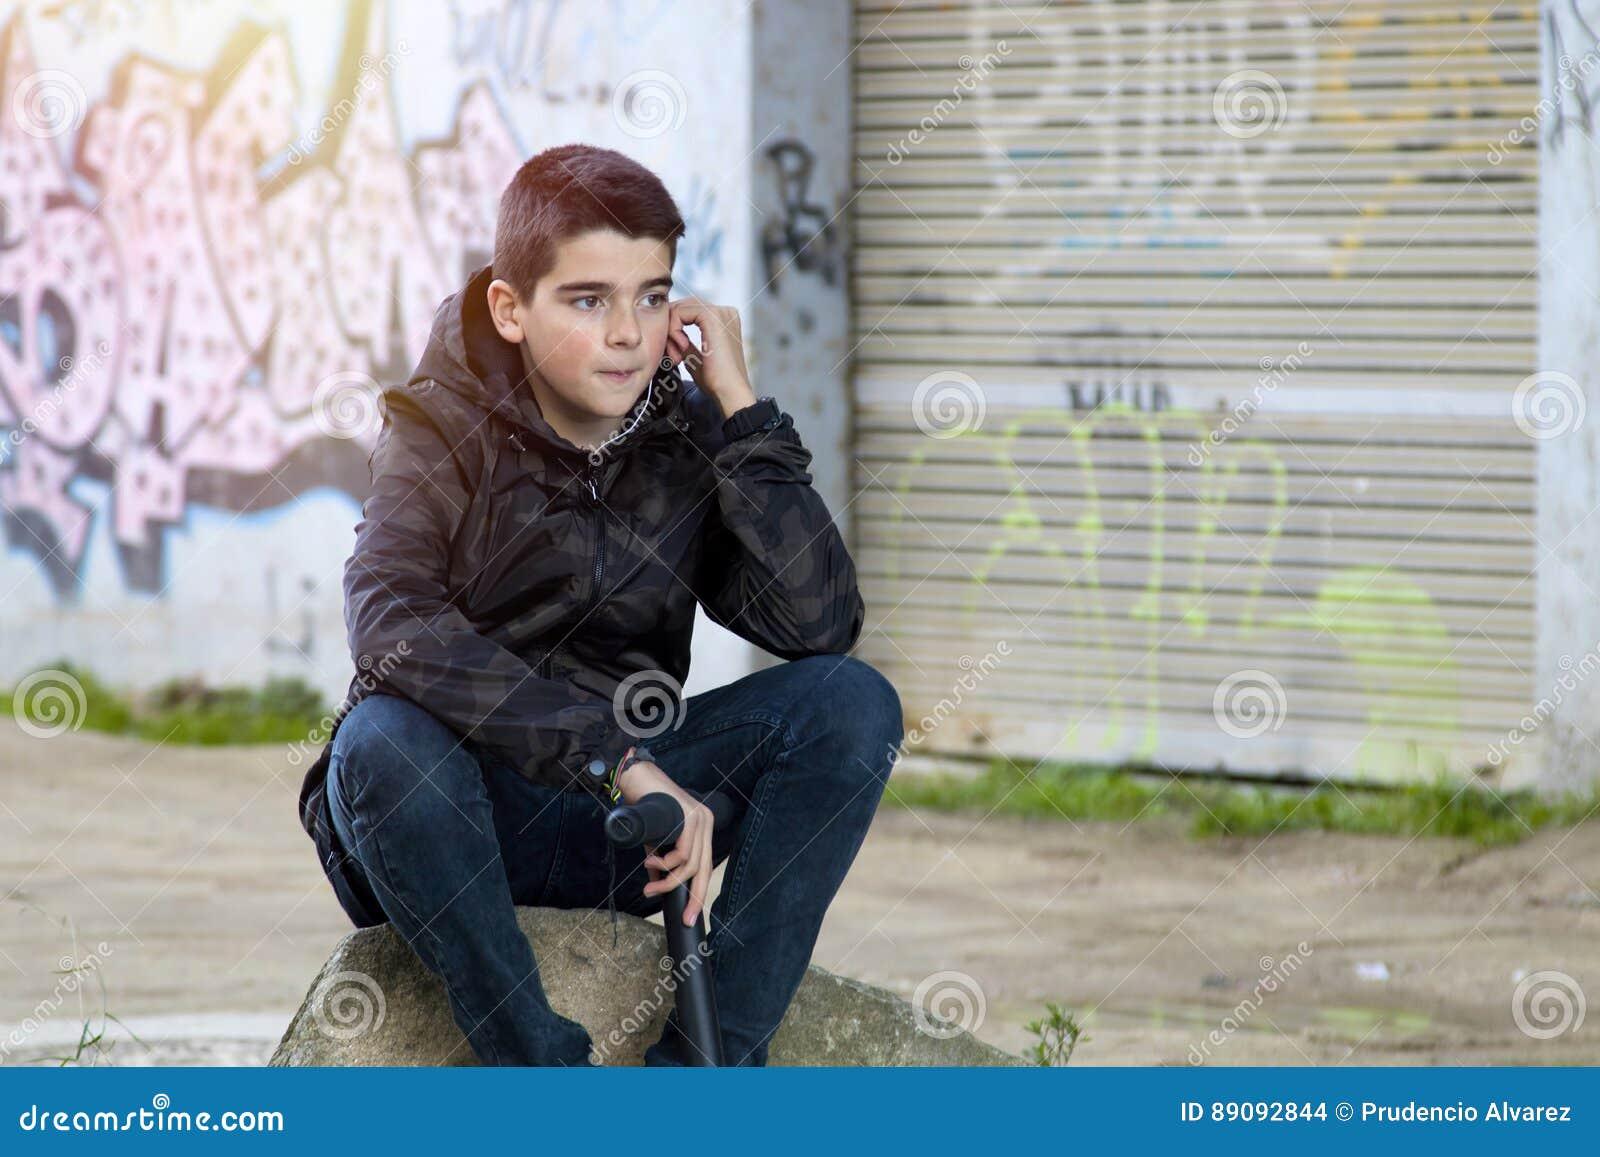 Boy Young Urban Style Stock Photo Image Of Garage Graffiti 89092844